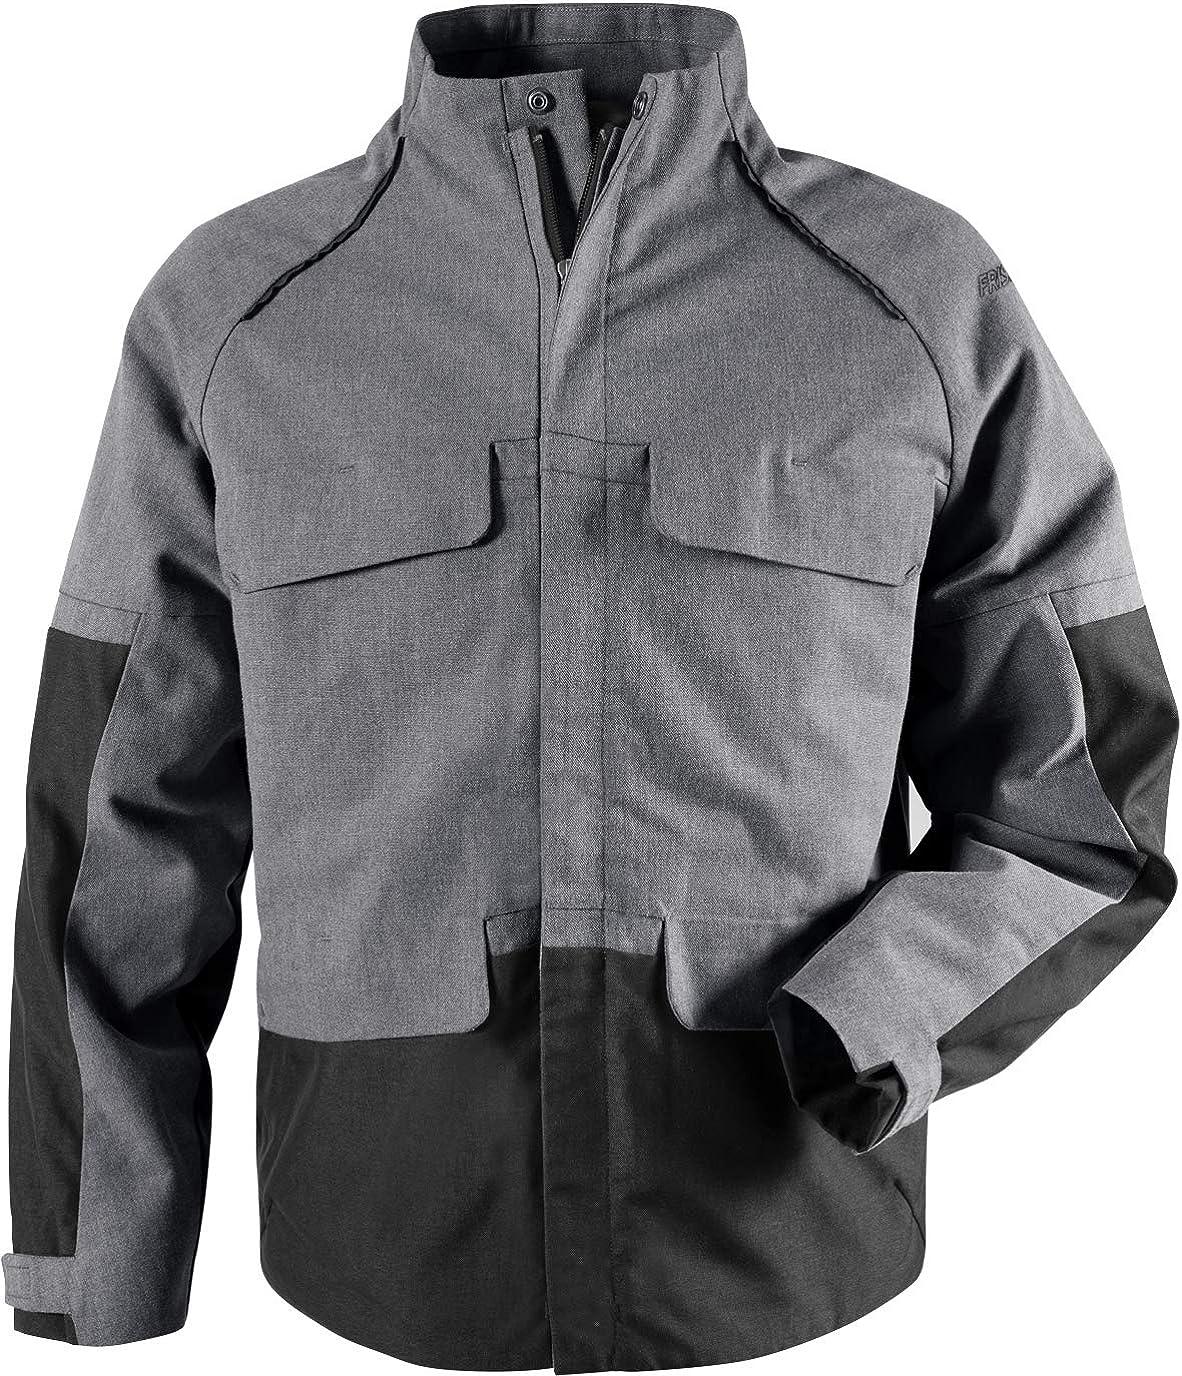 Fristads Workwear 130513 Mens Craftsman Jacket